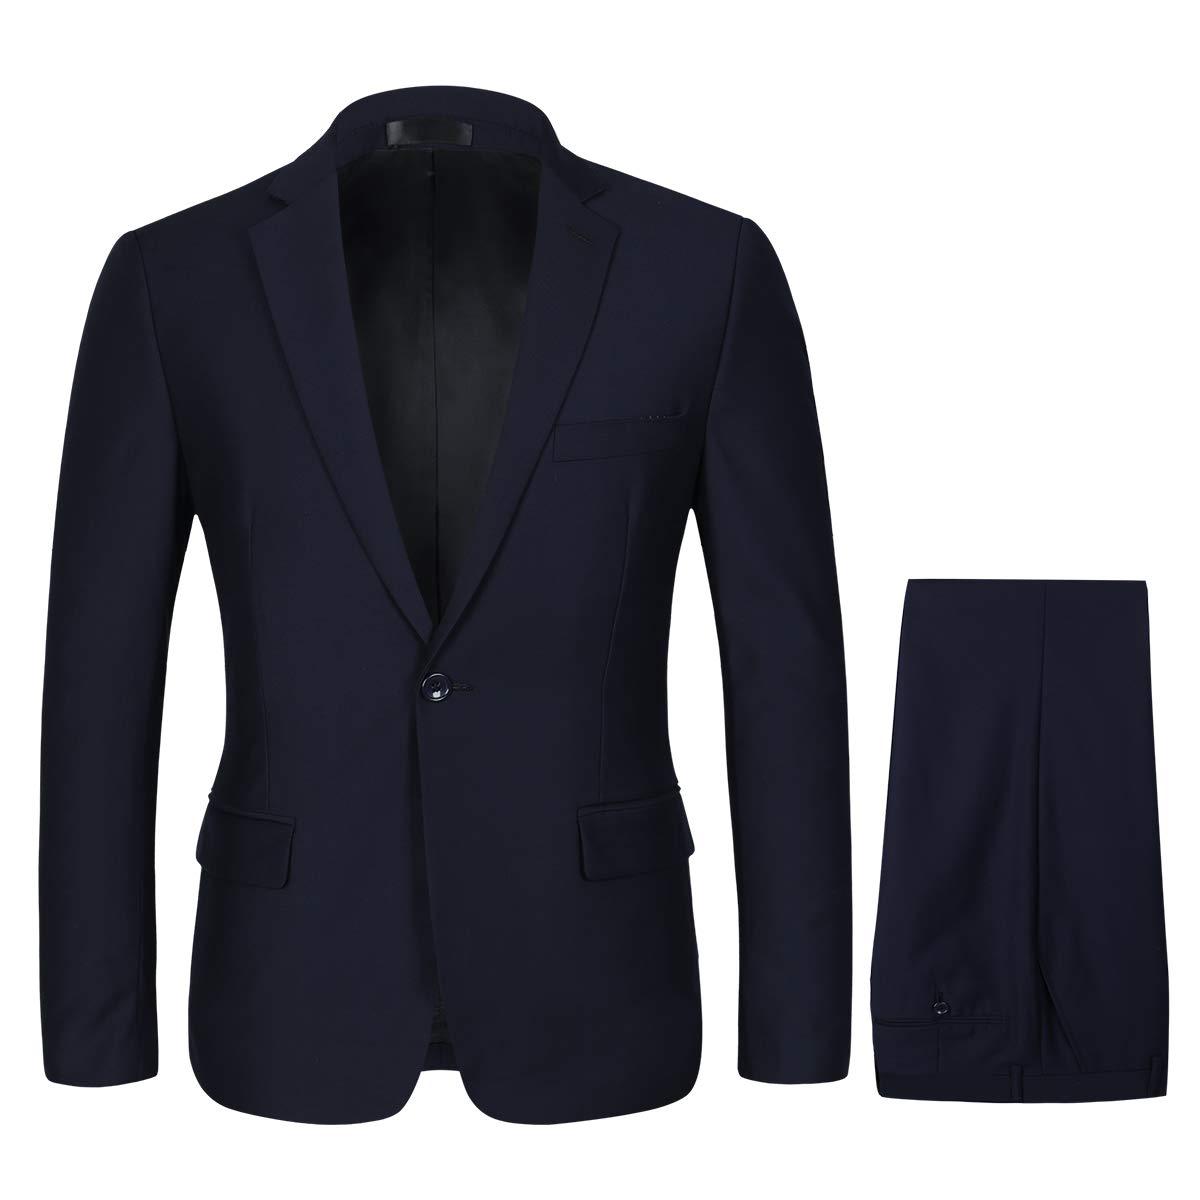 YOUTHUP Costumes Hommes 2 Pi/èces Slim Fit Costume Mariage Mode Veste + Pantalon